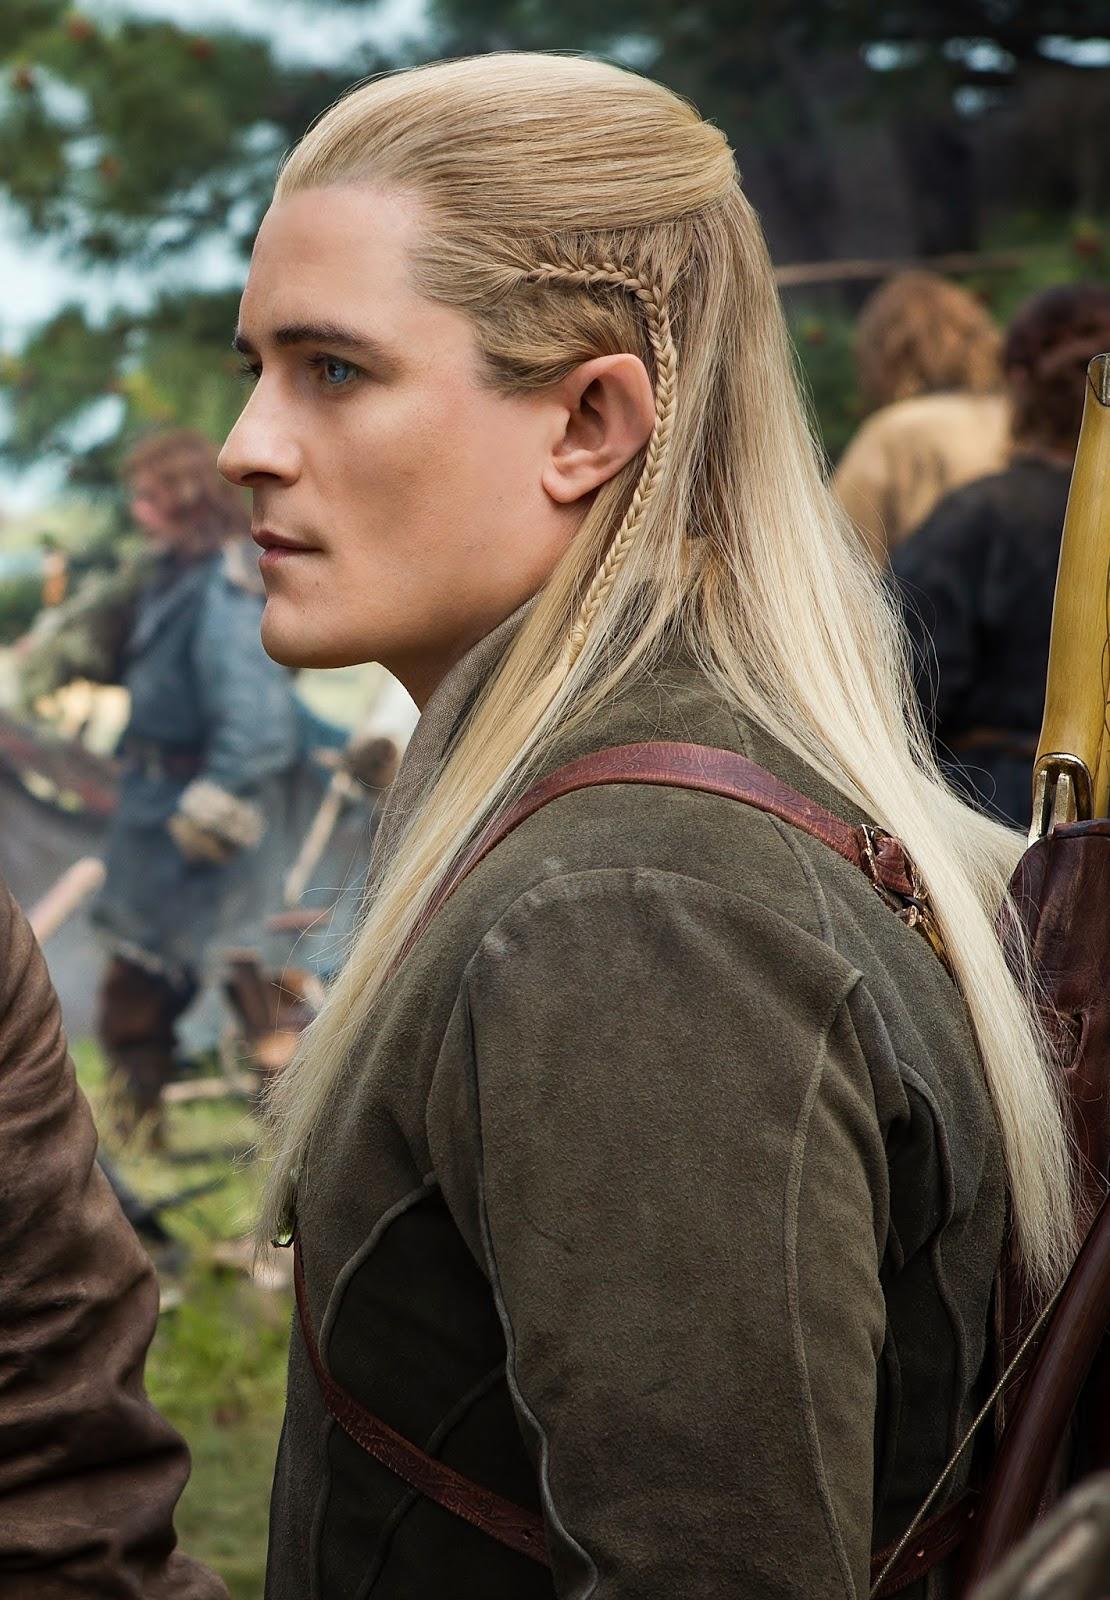 Braid hairstyle tutorial Legolas hair the hobbit - YouTube